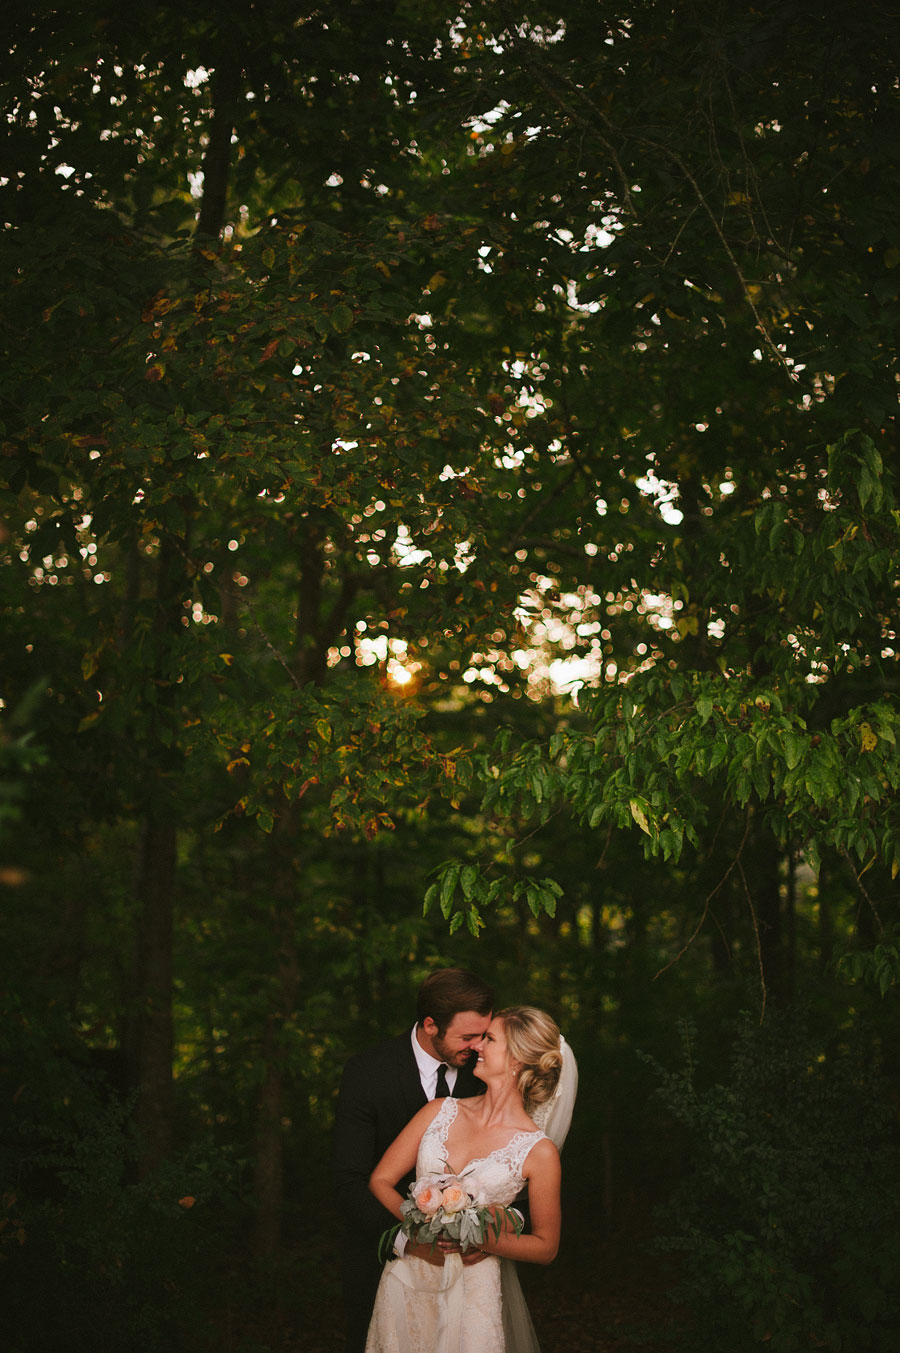 nashvillewedding_leipersforkwedding_farmwedding_bytheimageisfound_0162.jpg